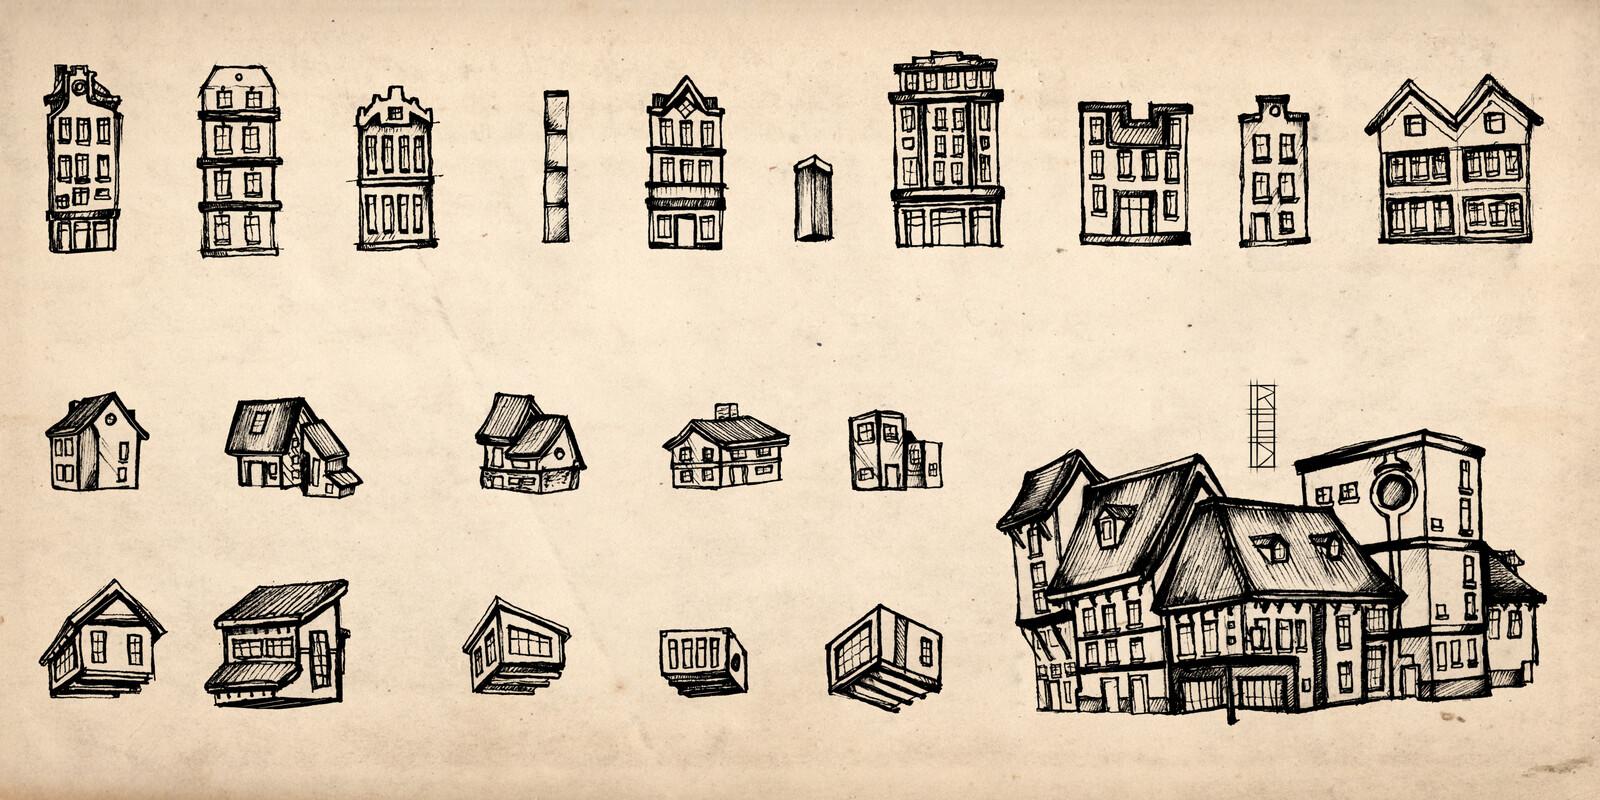 Sketch Buildings Assets